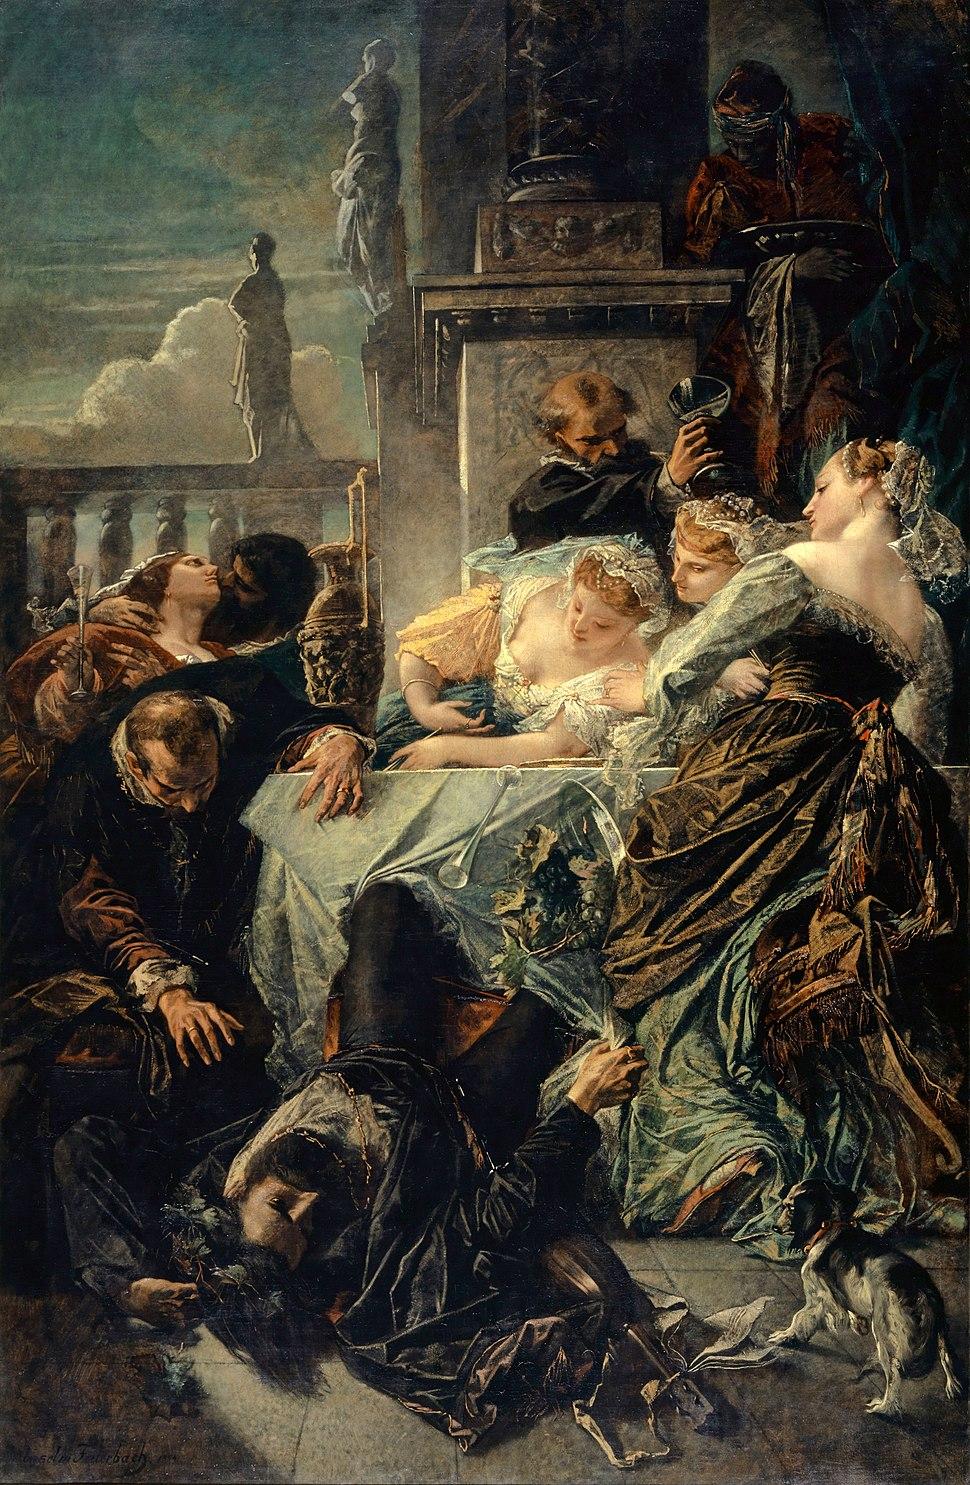 La muerte de Pietro Aretino, por Anselm Feuerbach